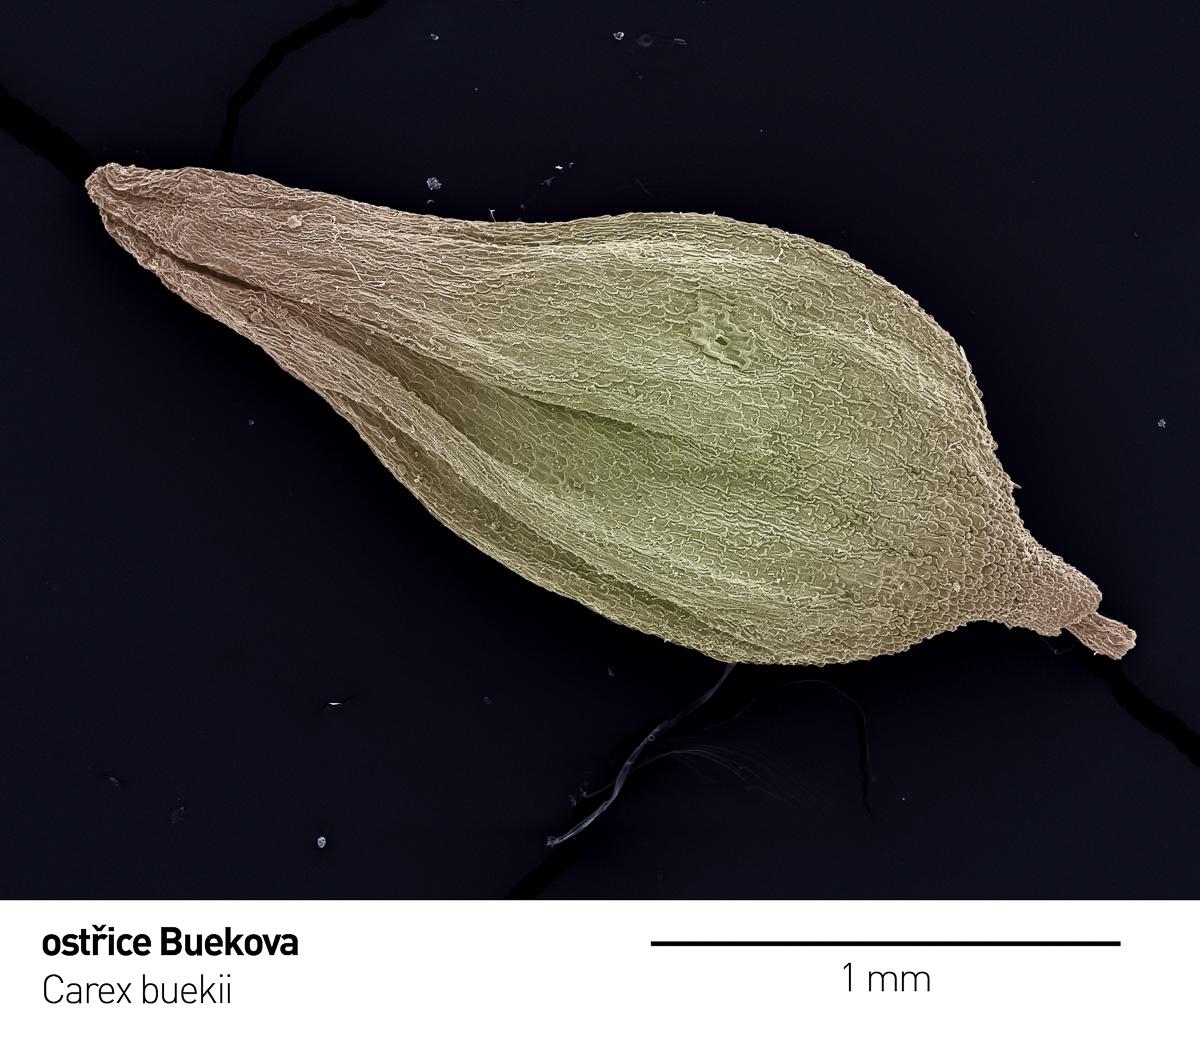 Carex_bueckii 1 a x.jpg